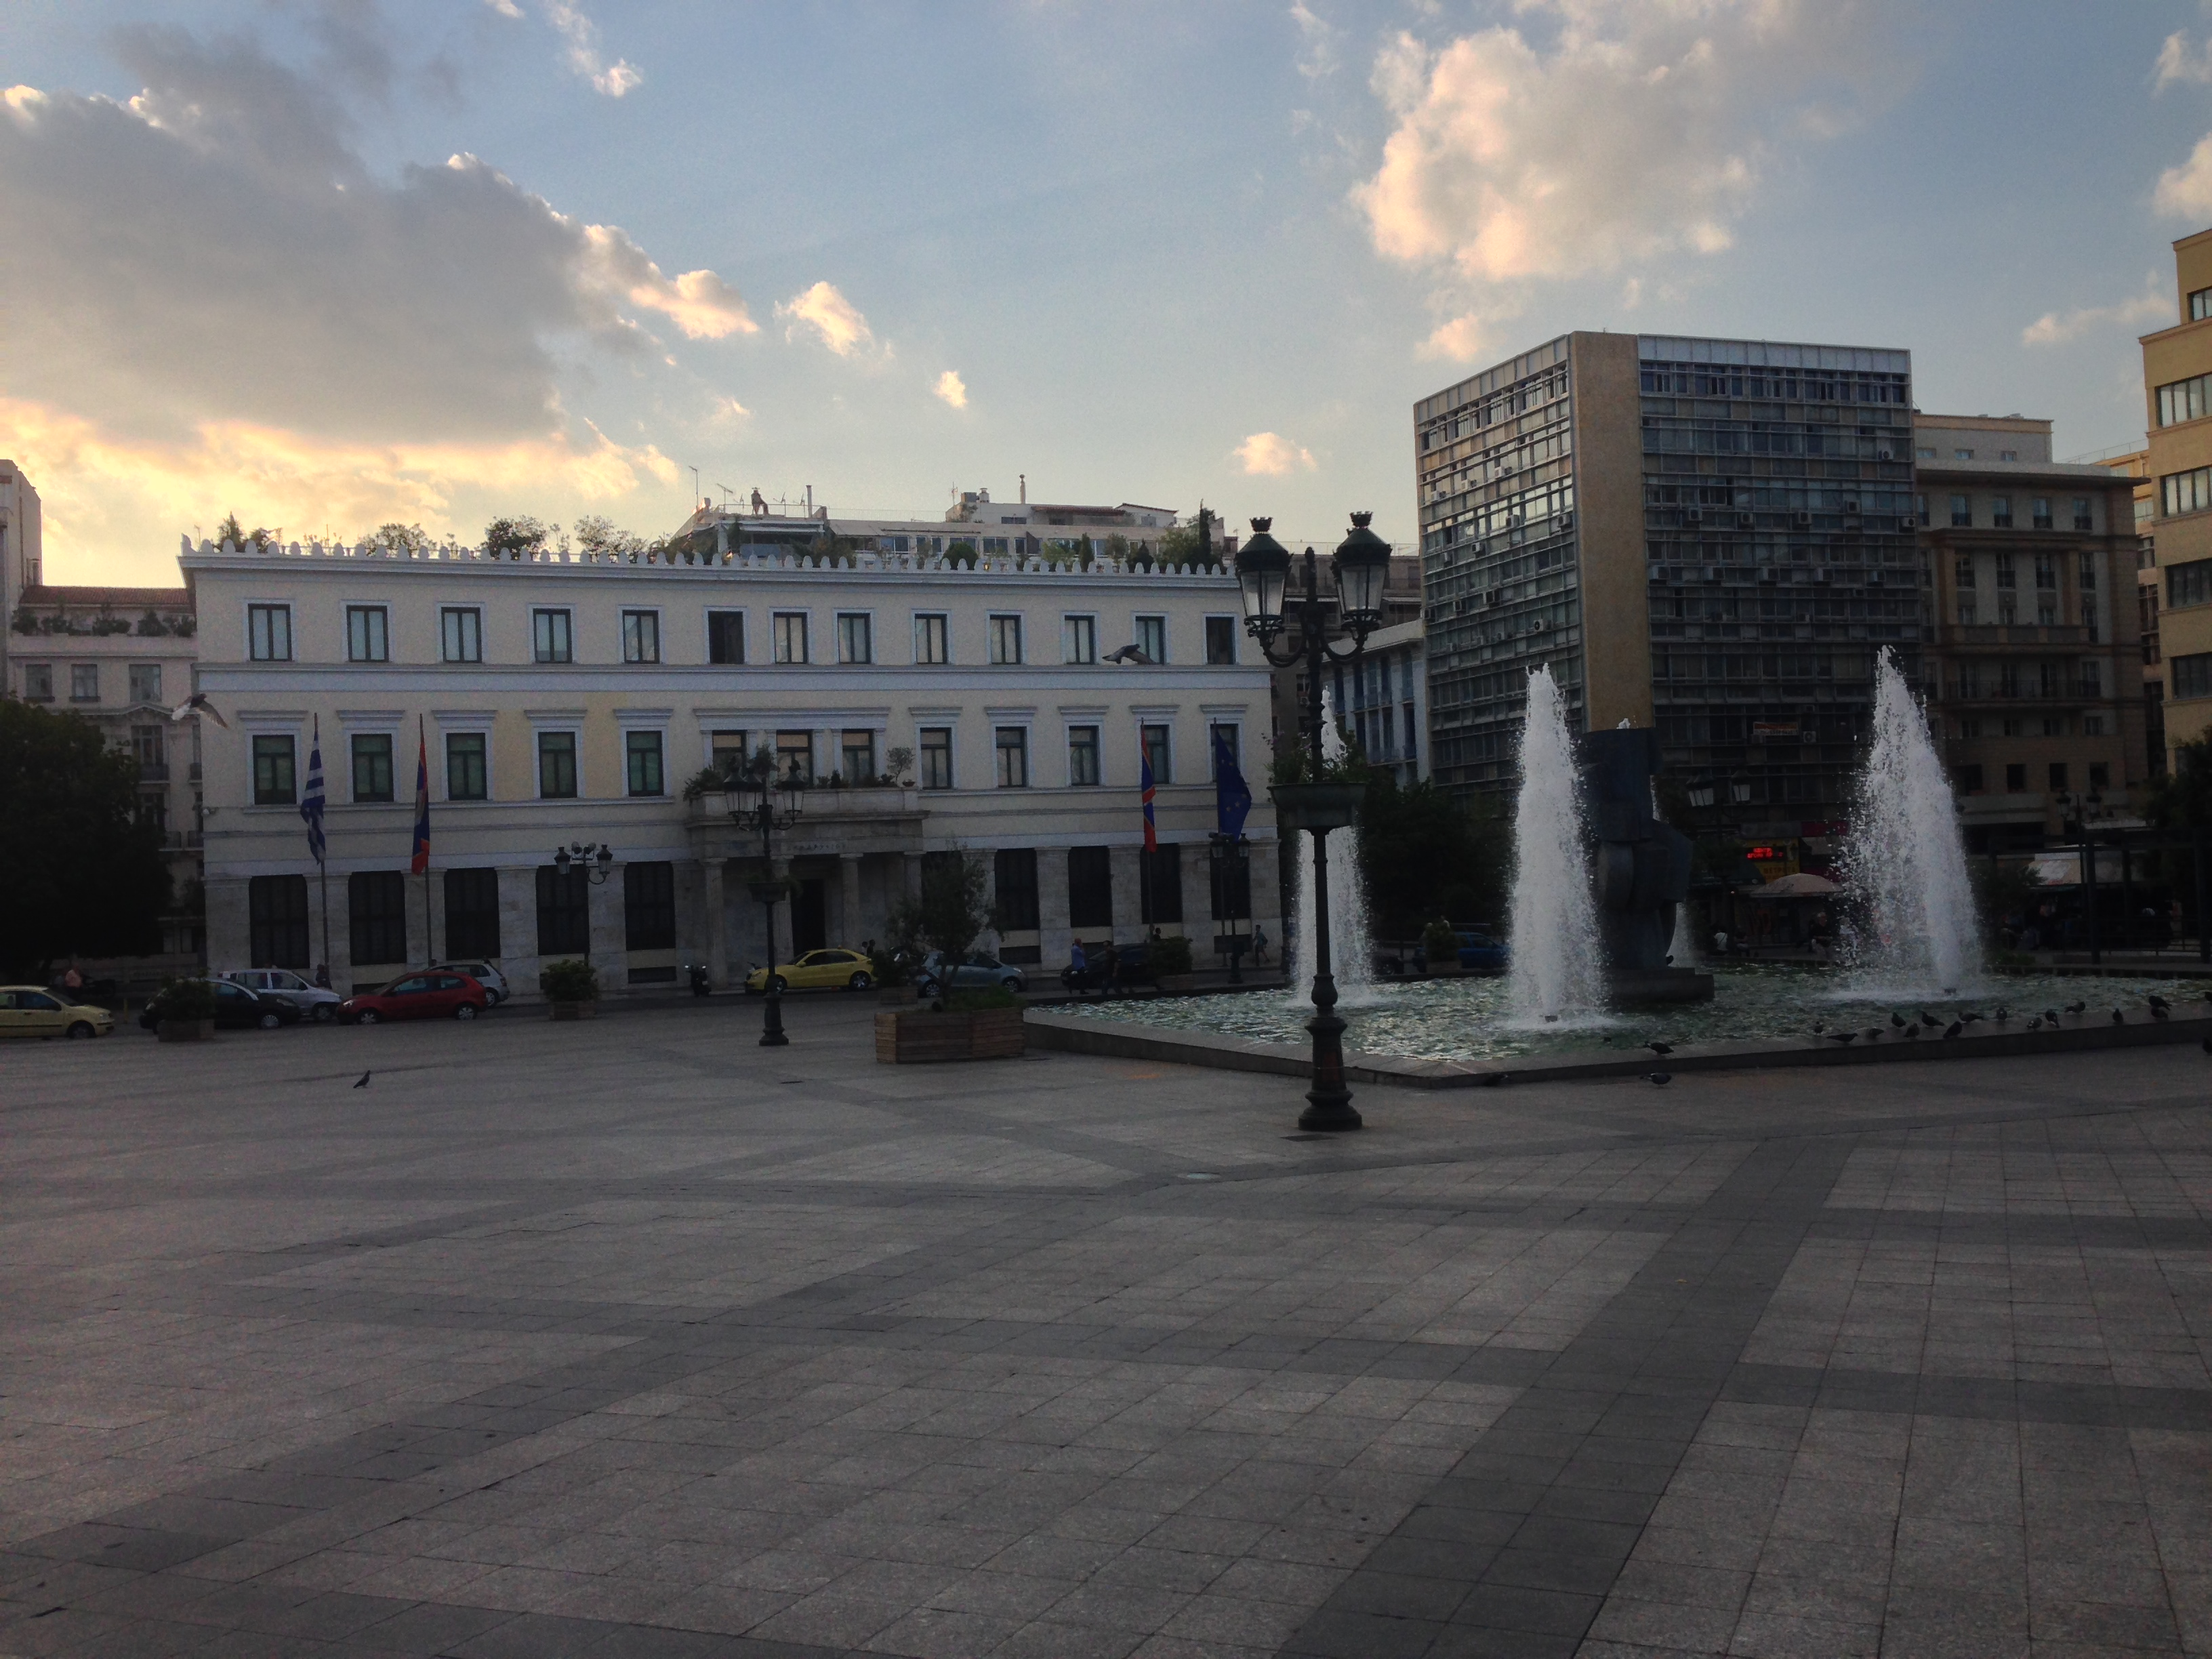 Kotzia sq. - Πλατεία Κοτζιά - panoramio.jpg